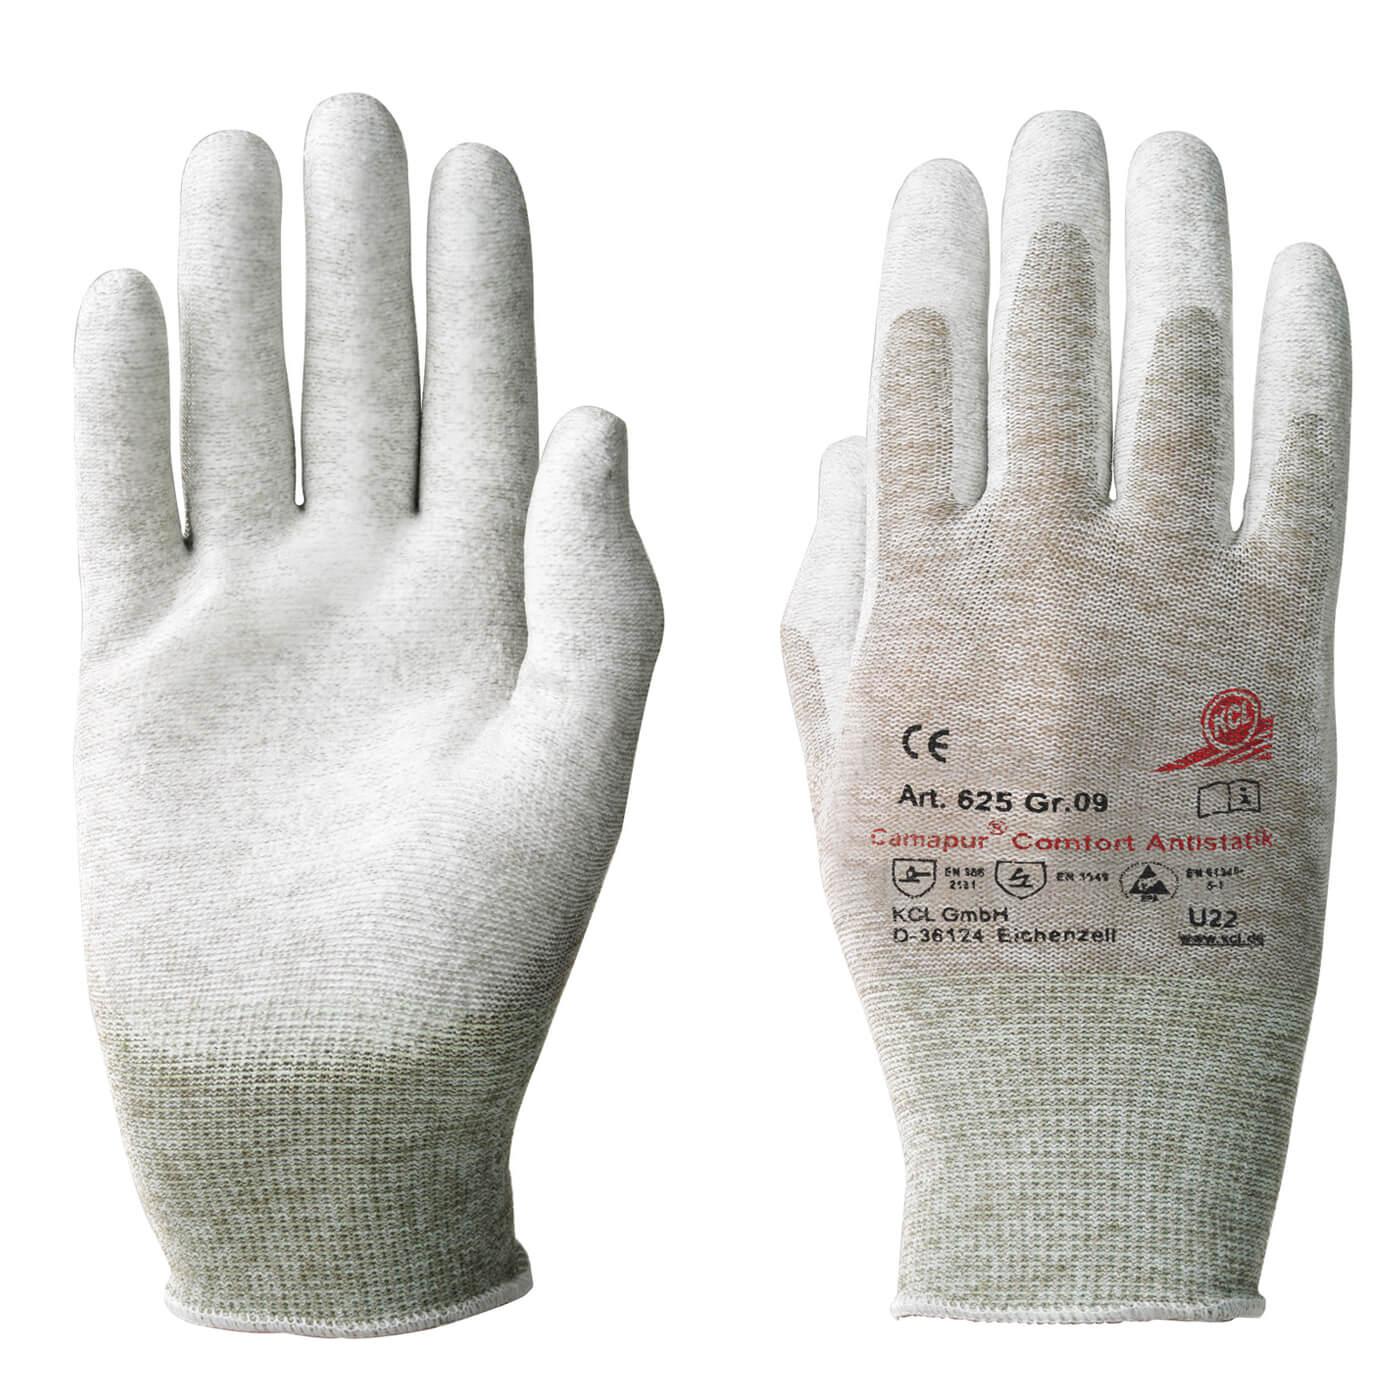 Rękawice antystatyczne KCL 625 CAMAPUR COMFORT ANTISTATIK